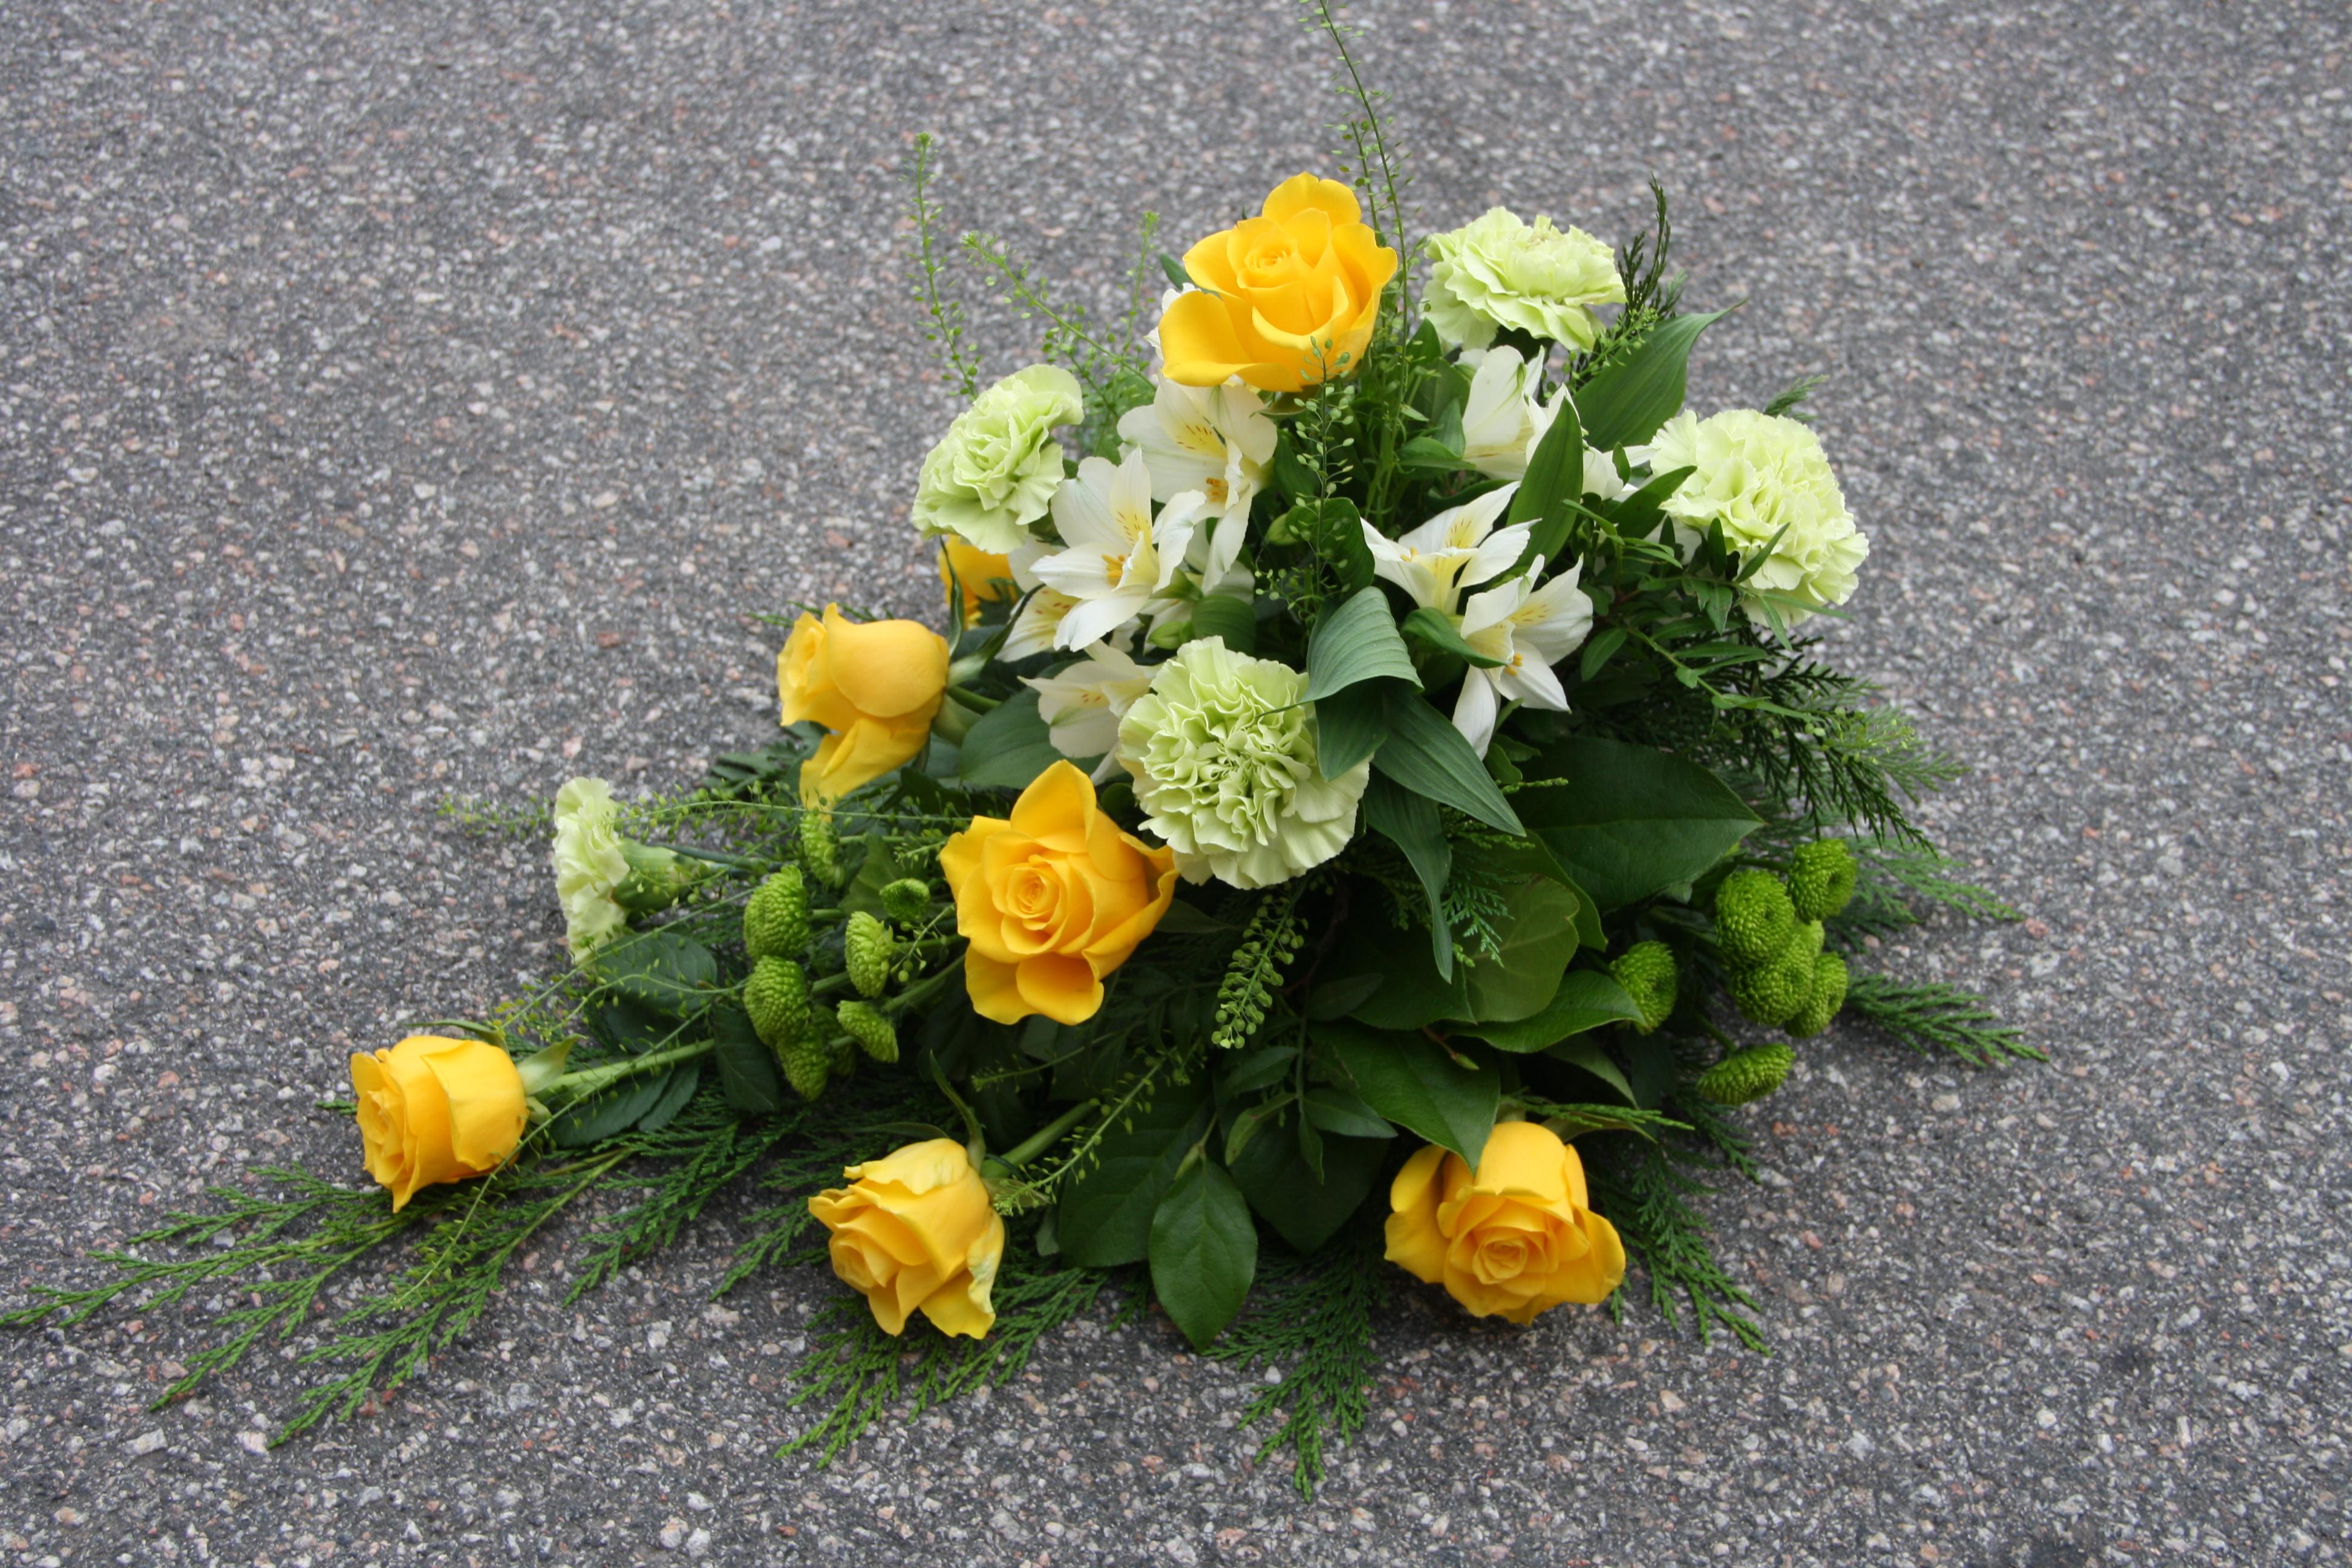 Begravning11